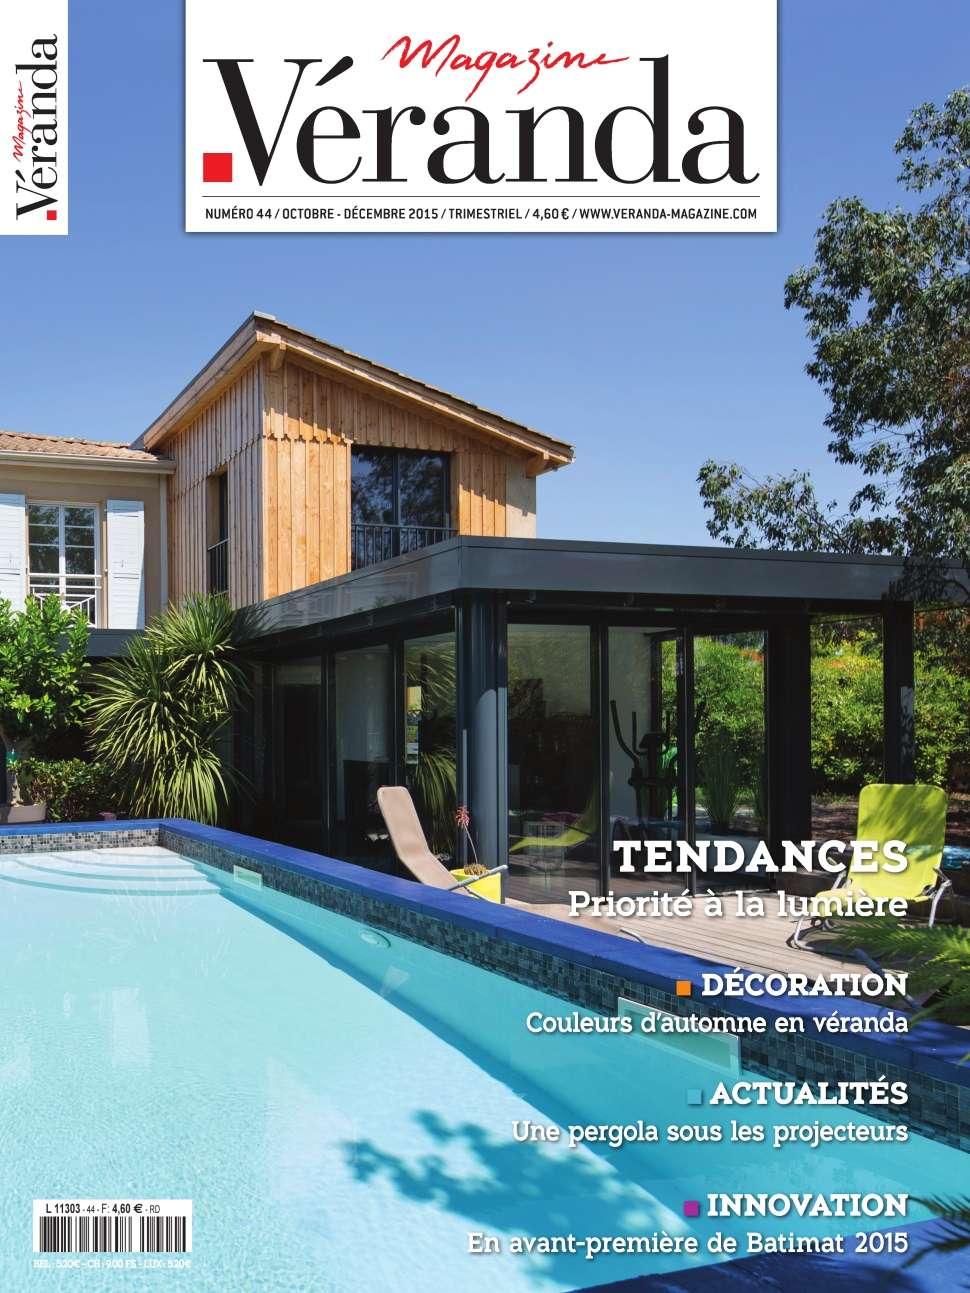 Veranda Magazine 44 - Octobre 2015